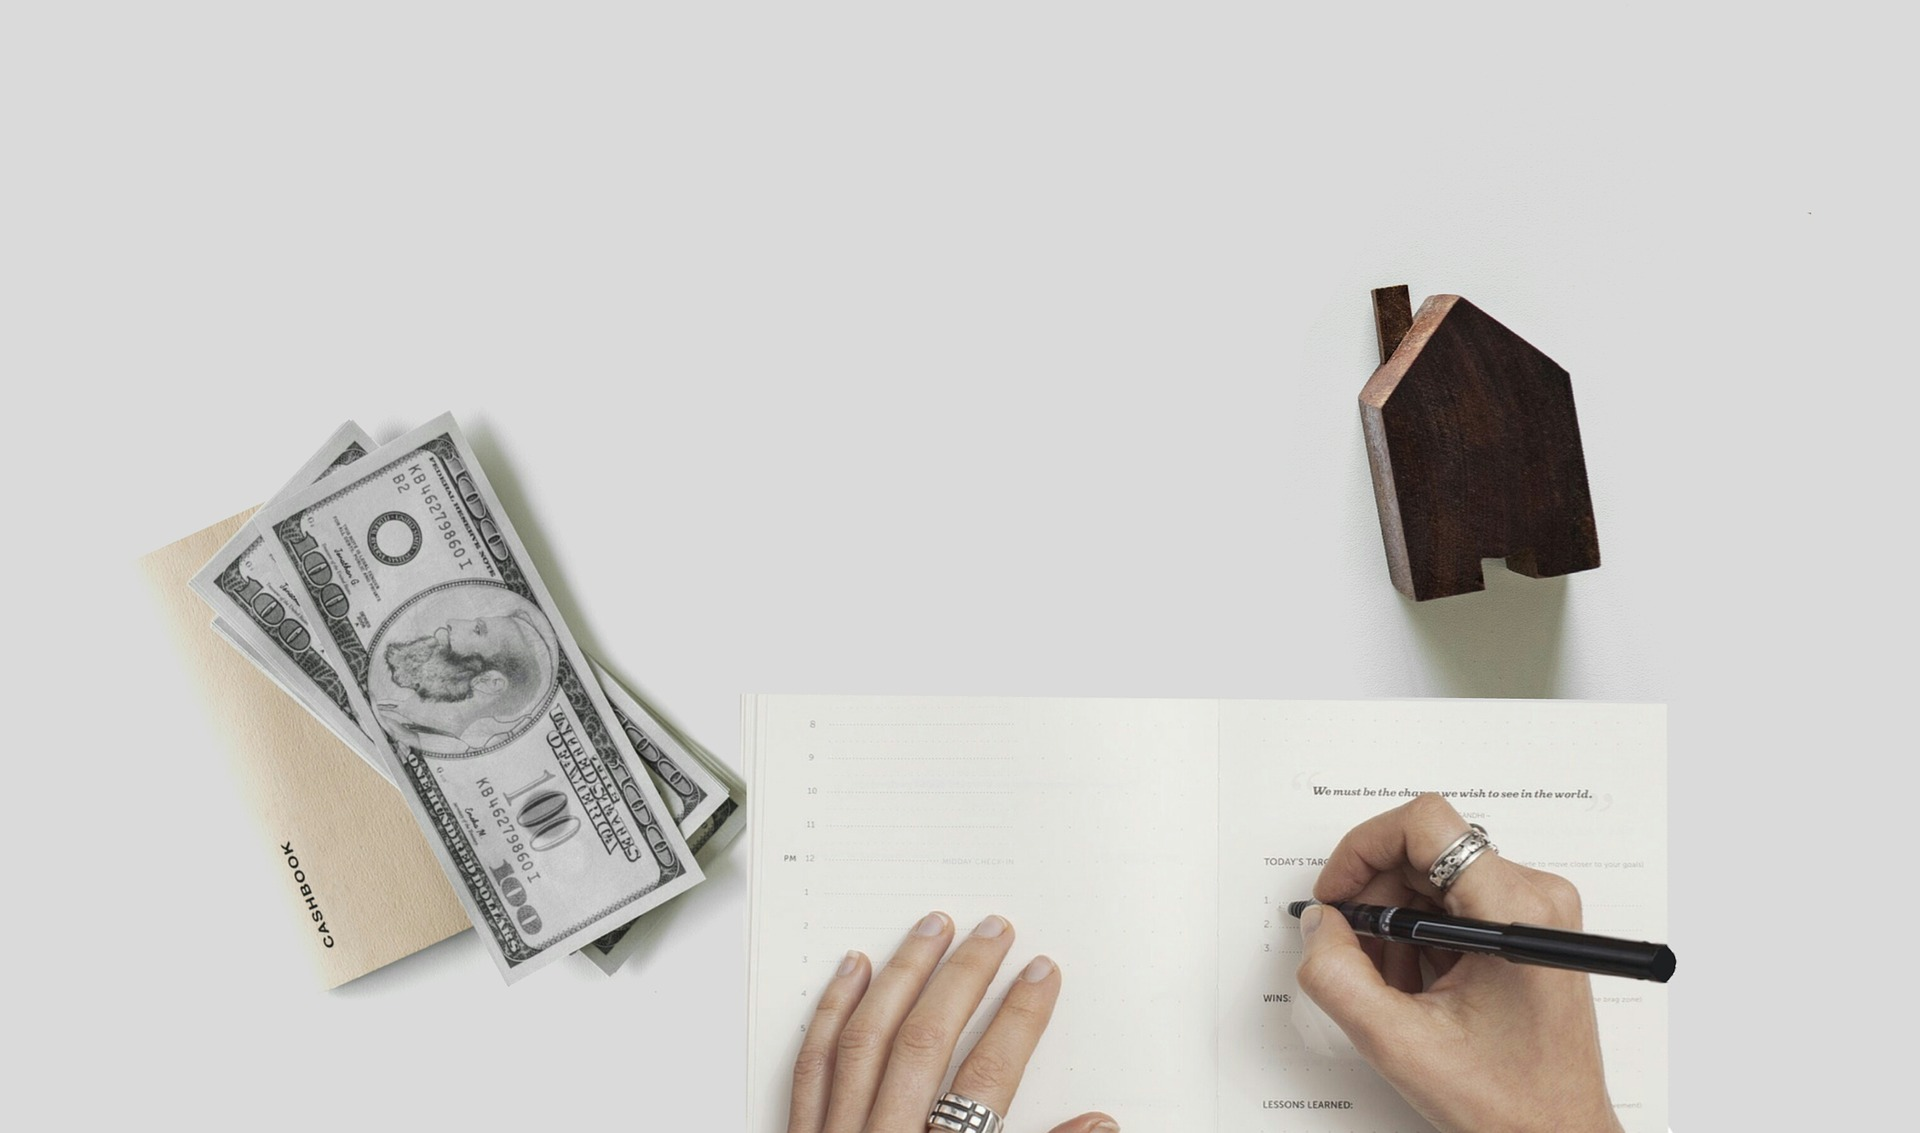 Ask The Lawyer By: Daniel A. Gwinn, Esq. Working on a Cash Basis?